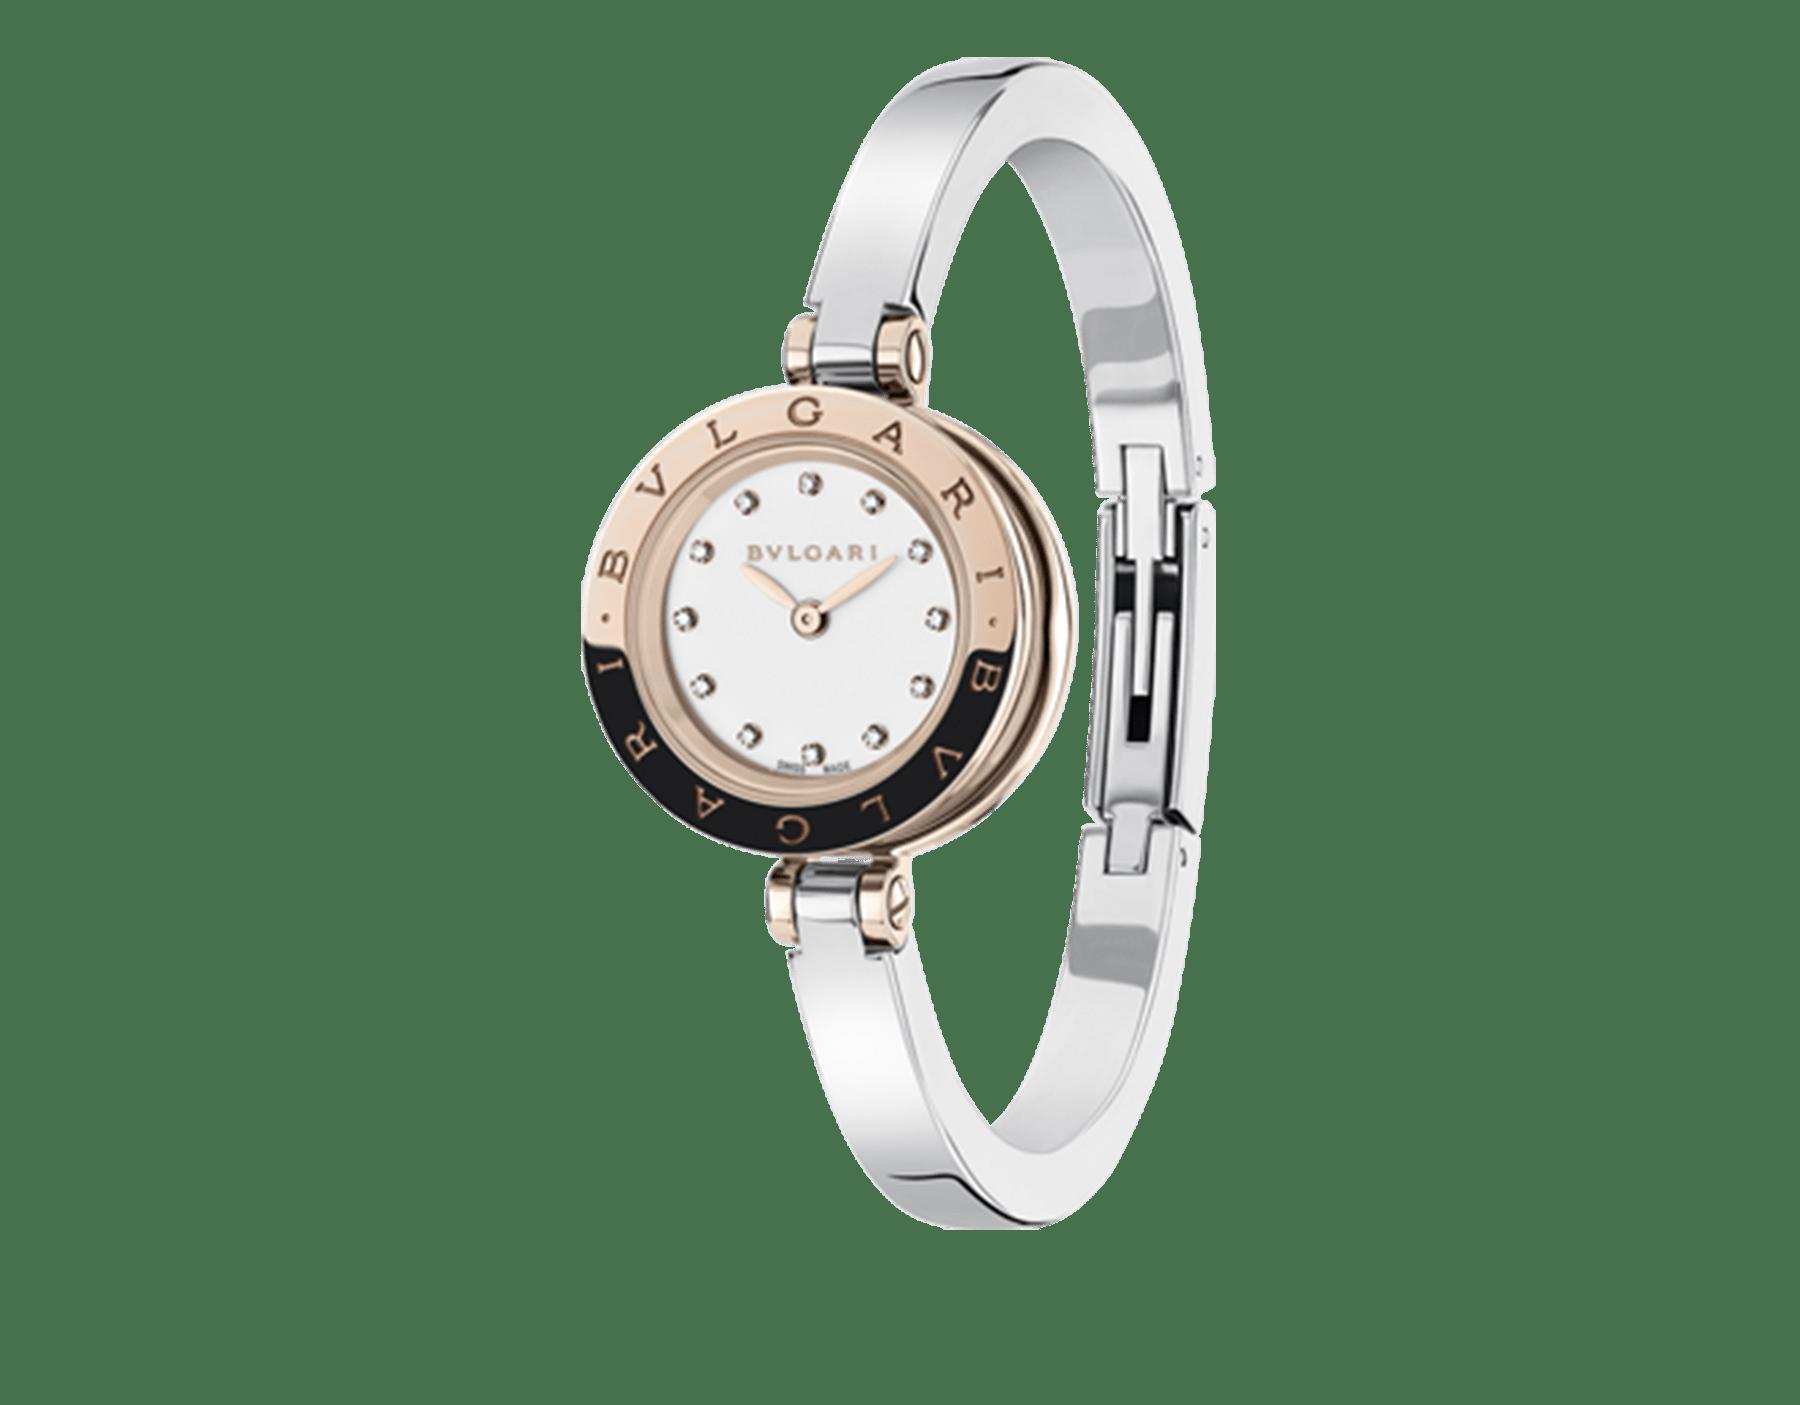 B.zero1 腕錶,精鋼和 18K 玫瑰金錶殼,精鋼錶帶,白色漆面錶盤,鑽石時標。M 尺寸。 102320 image 1